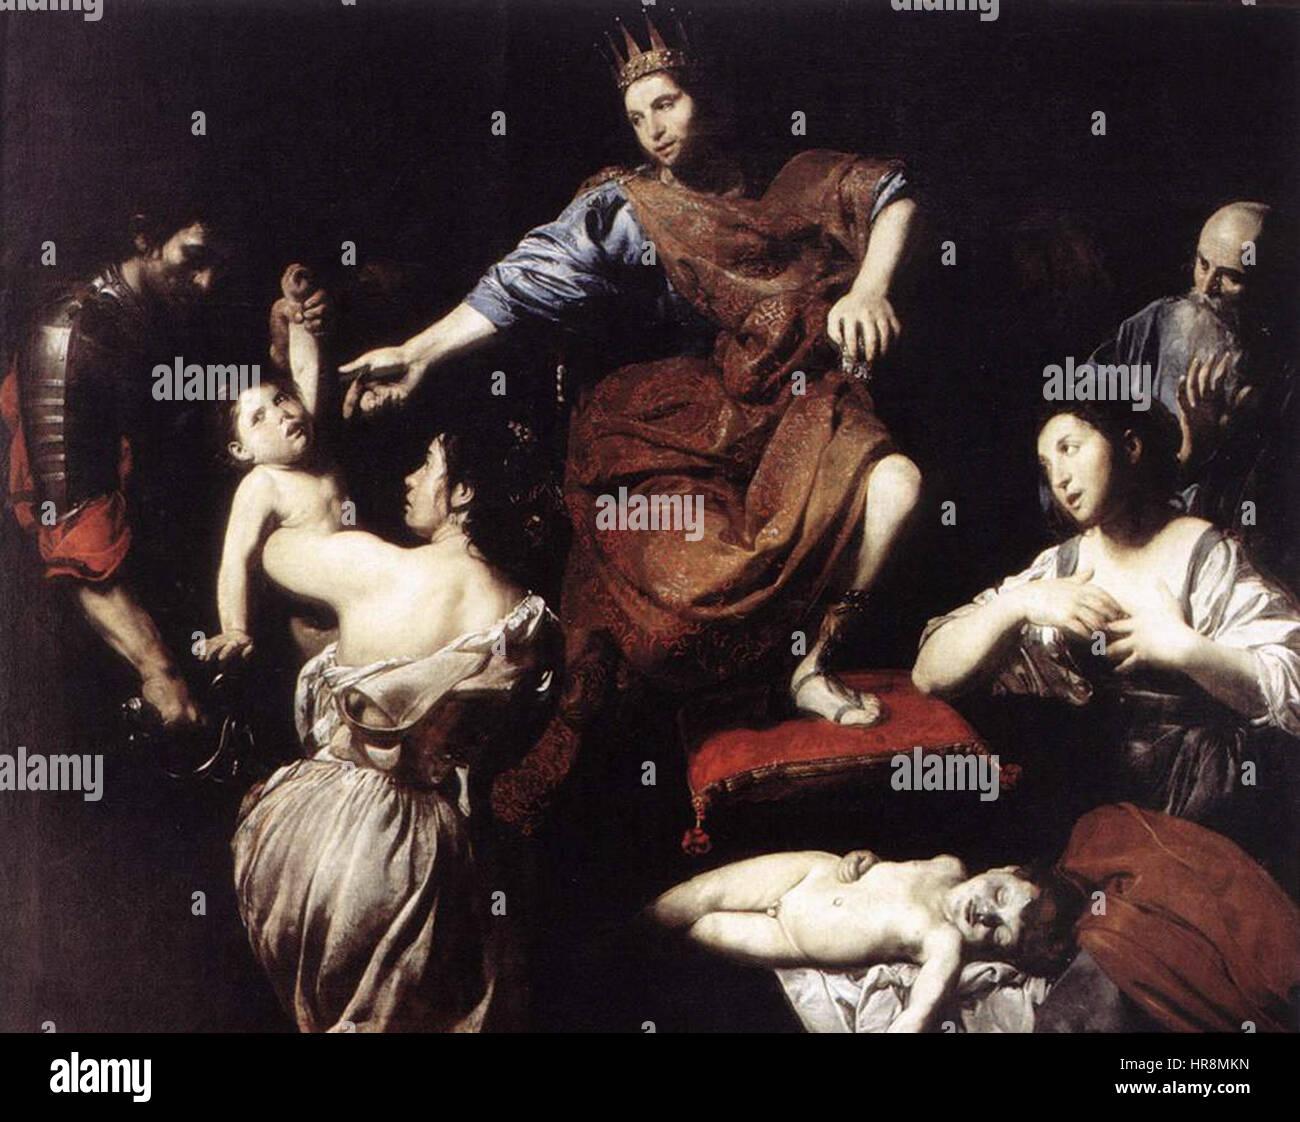 Valentin de Boulogne, Judgment of Solomon 01 - Stock Image